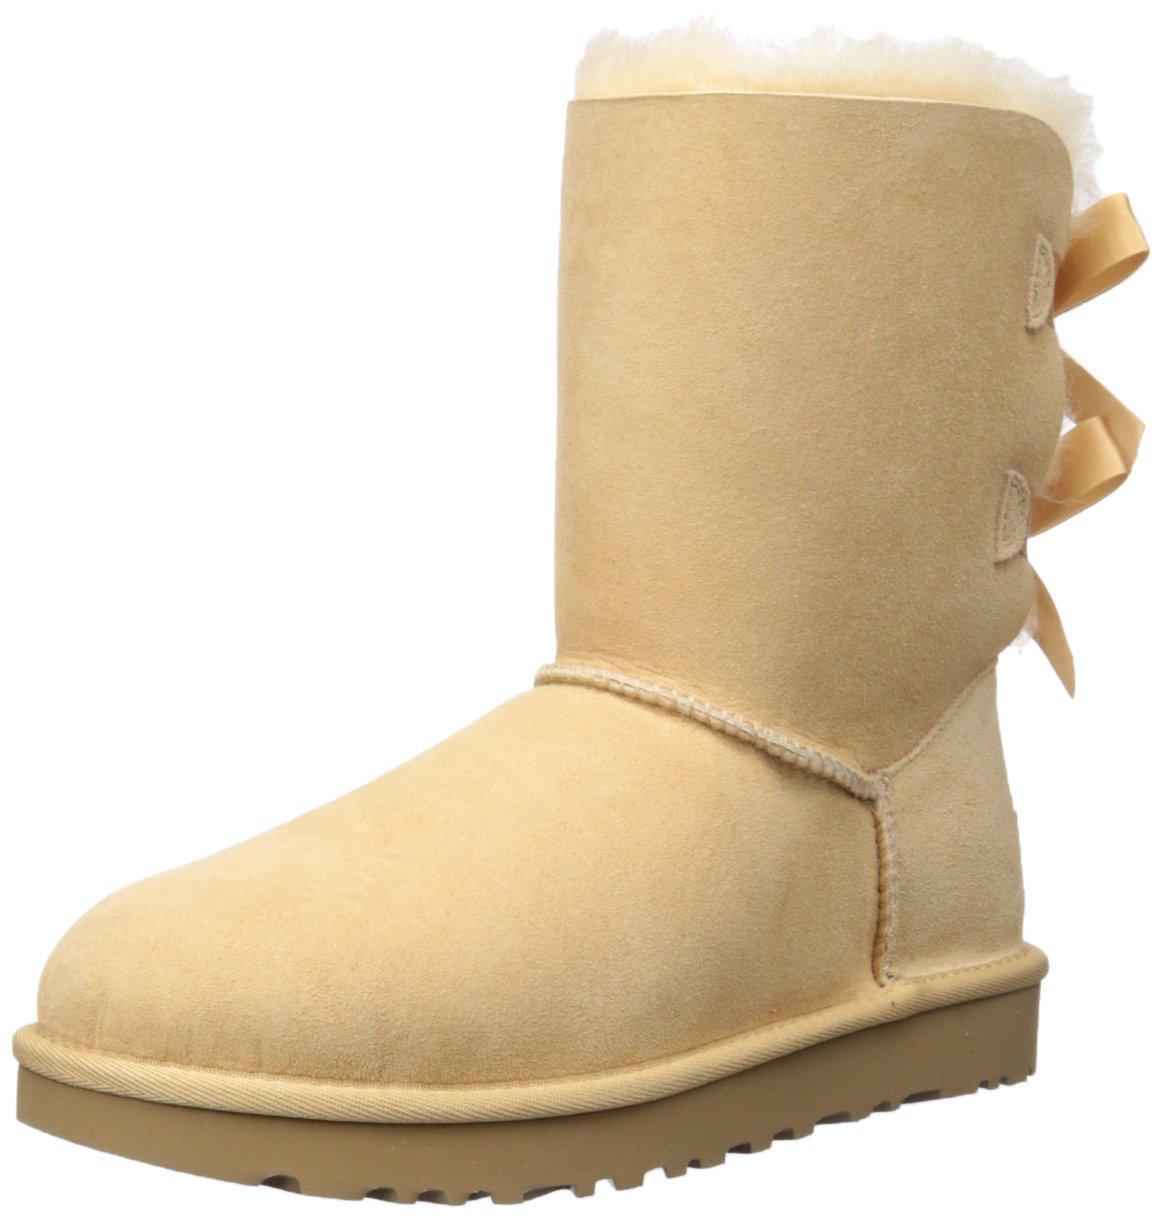 UGG Women's Bailey Bow II Fashion Boot, soft